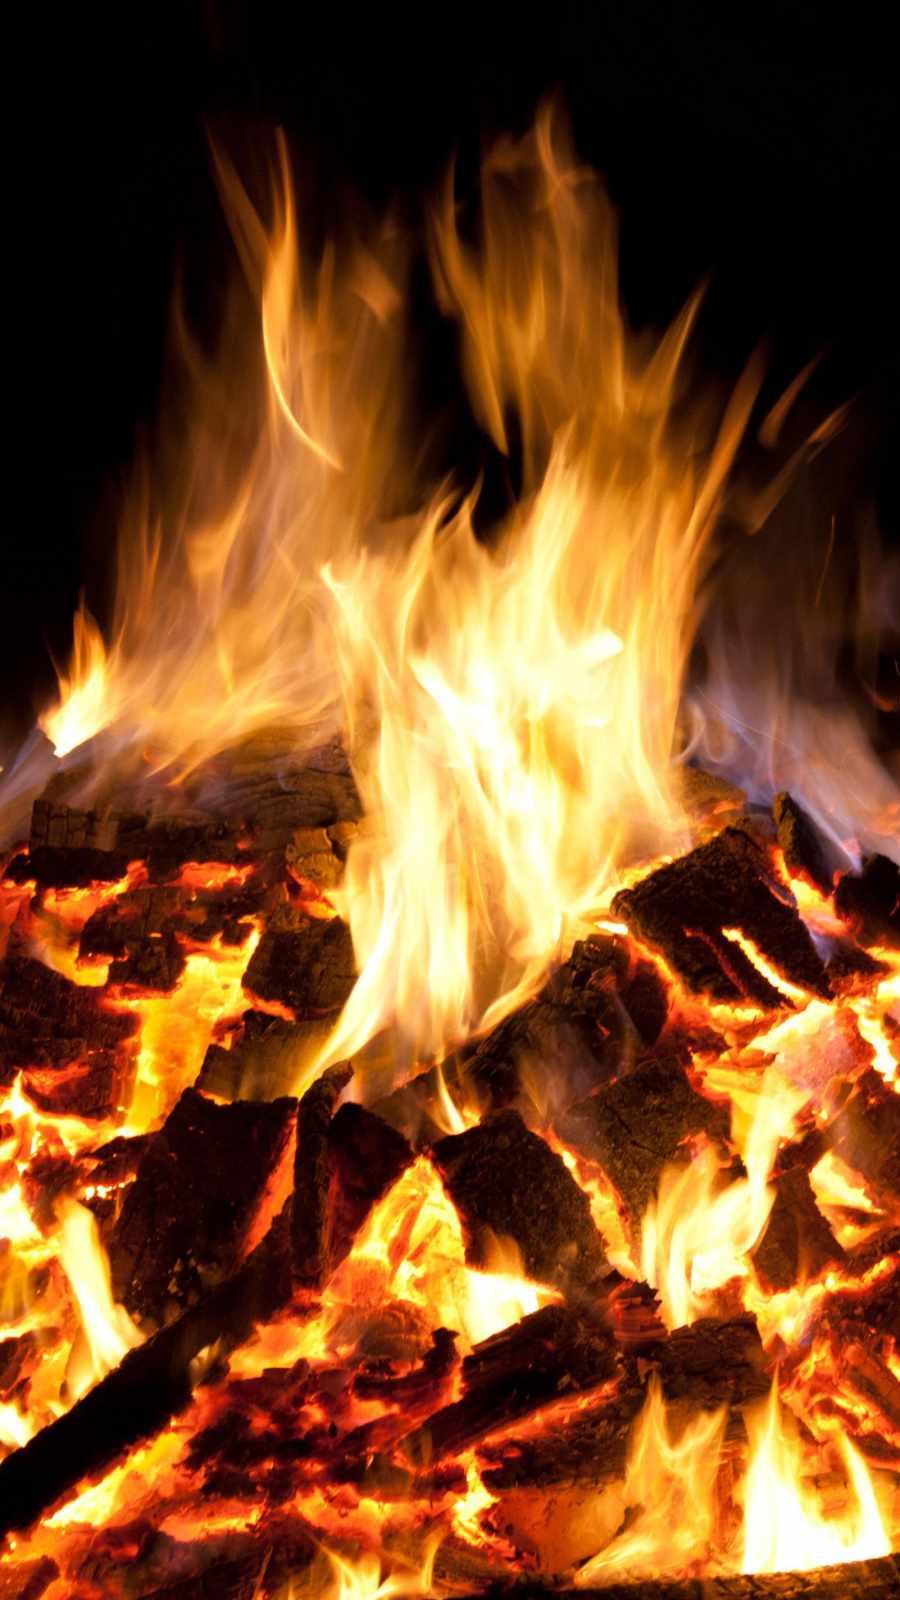 Fire Burning iPhone Wallpaper